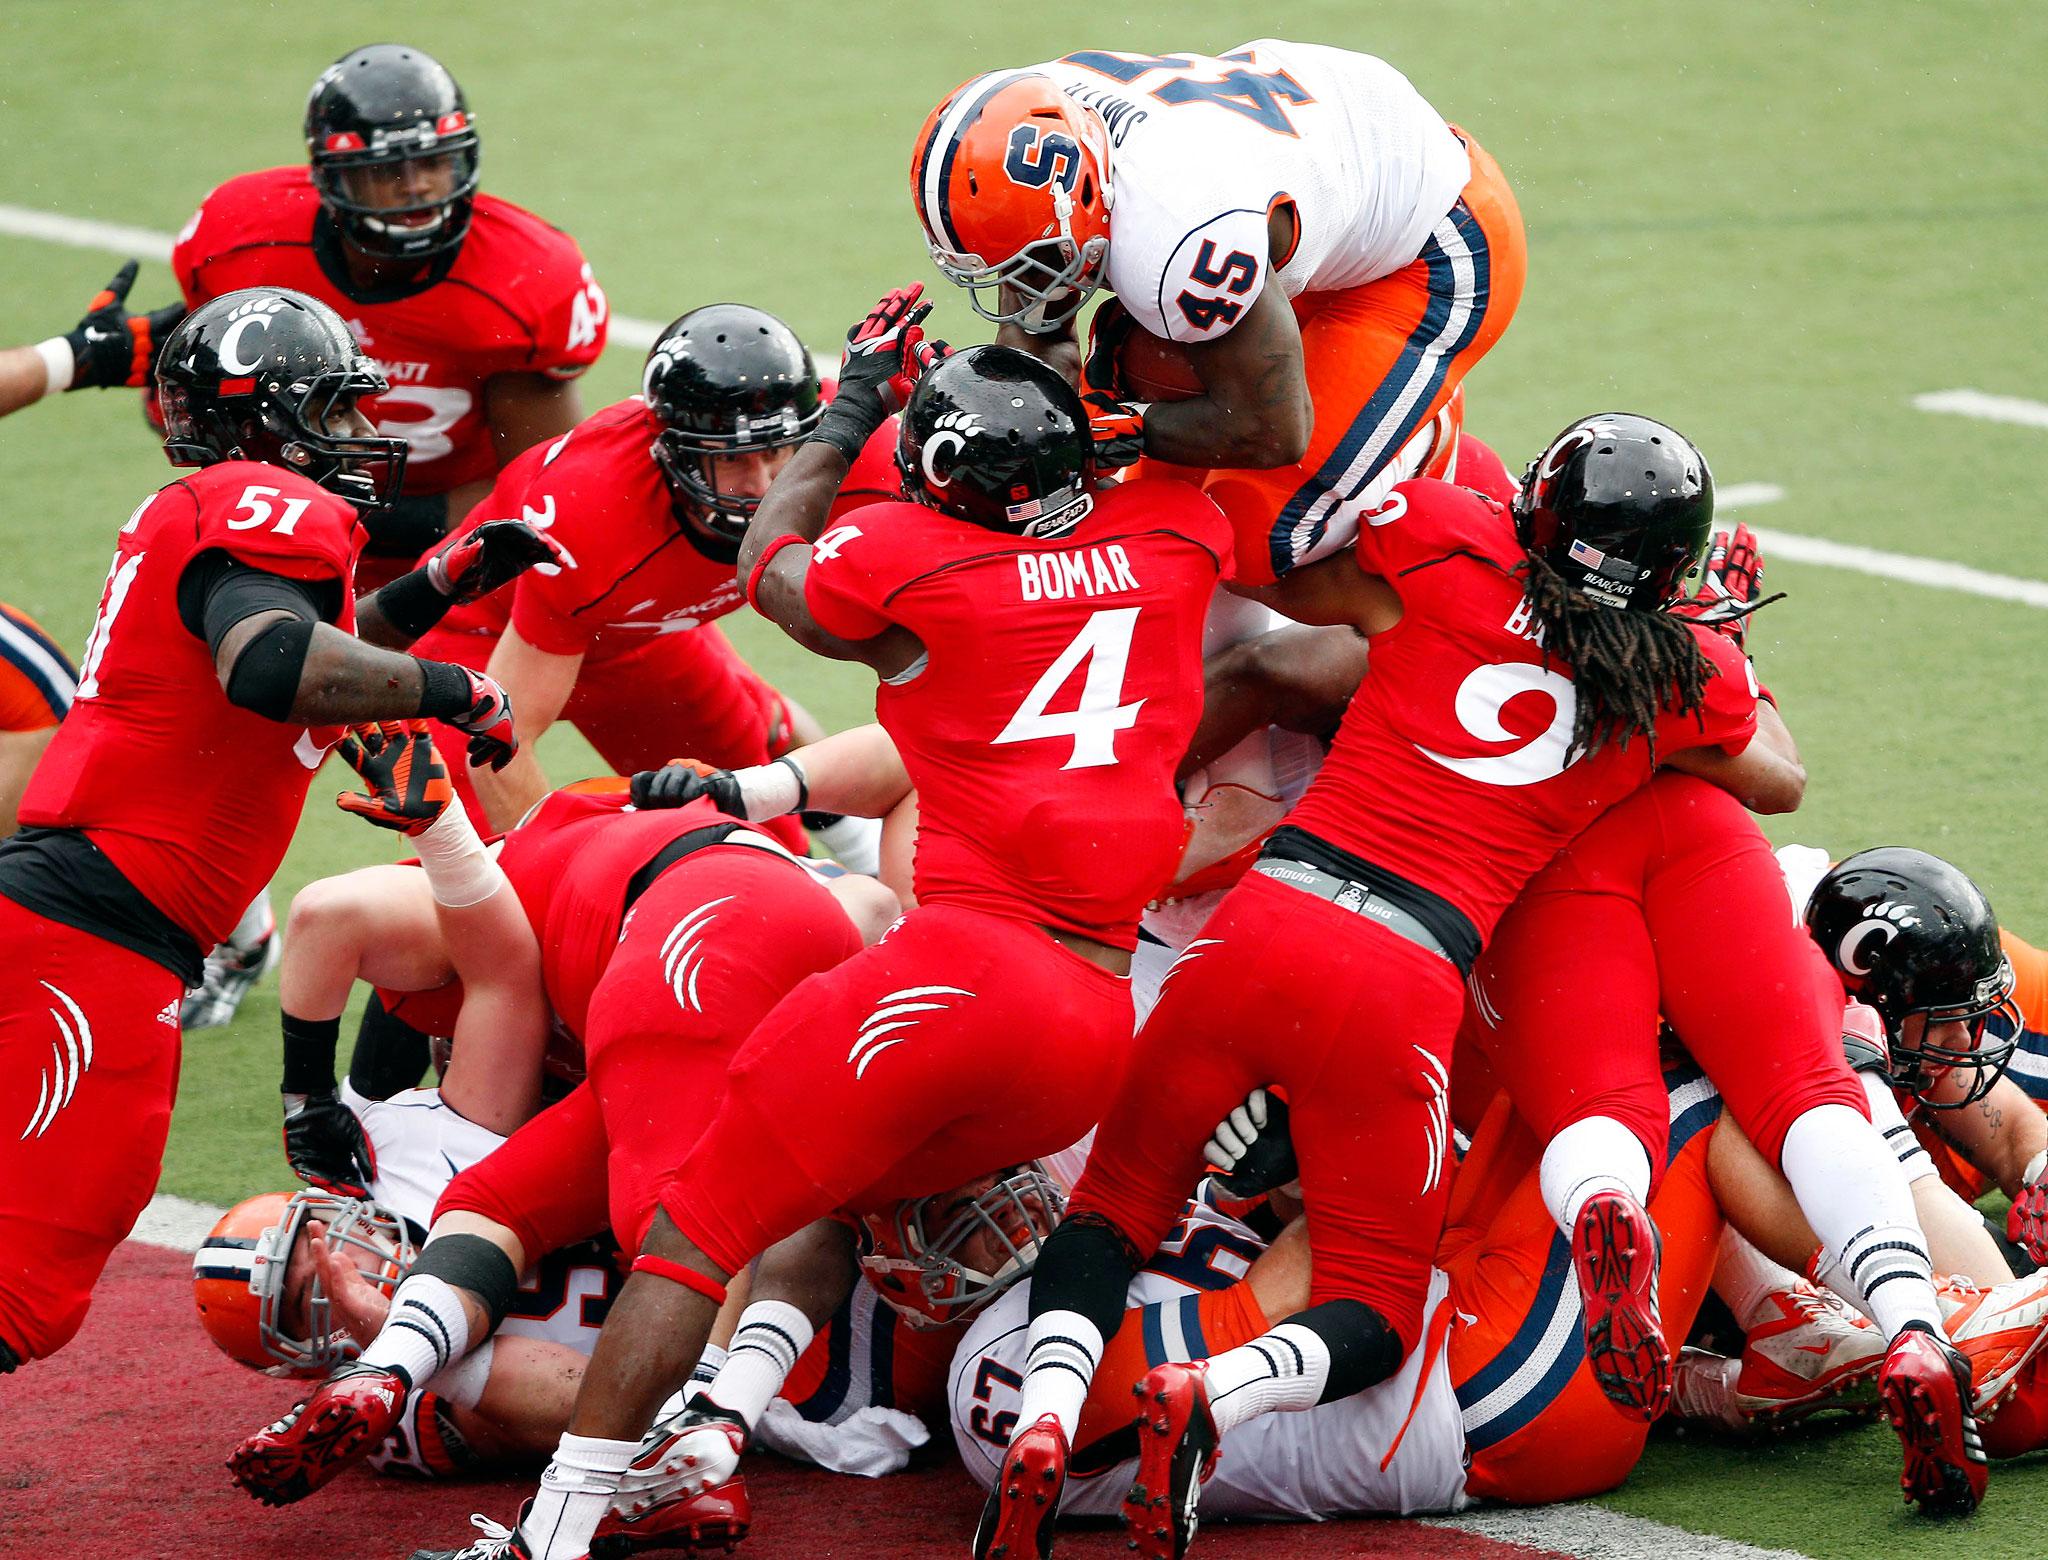 cbs college football scores espn ncf